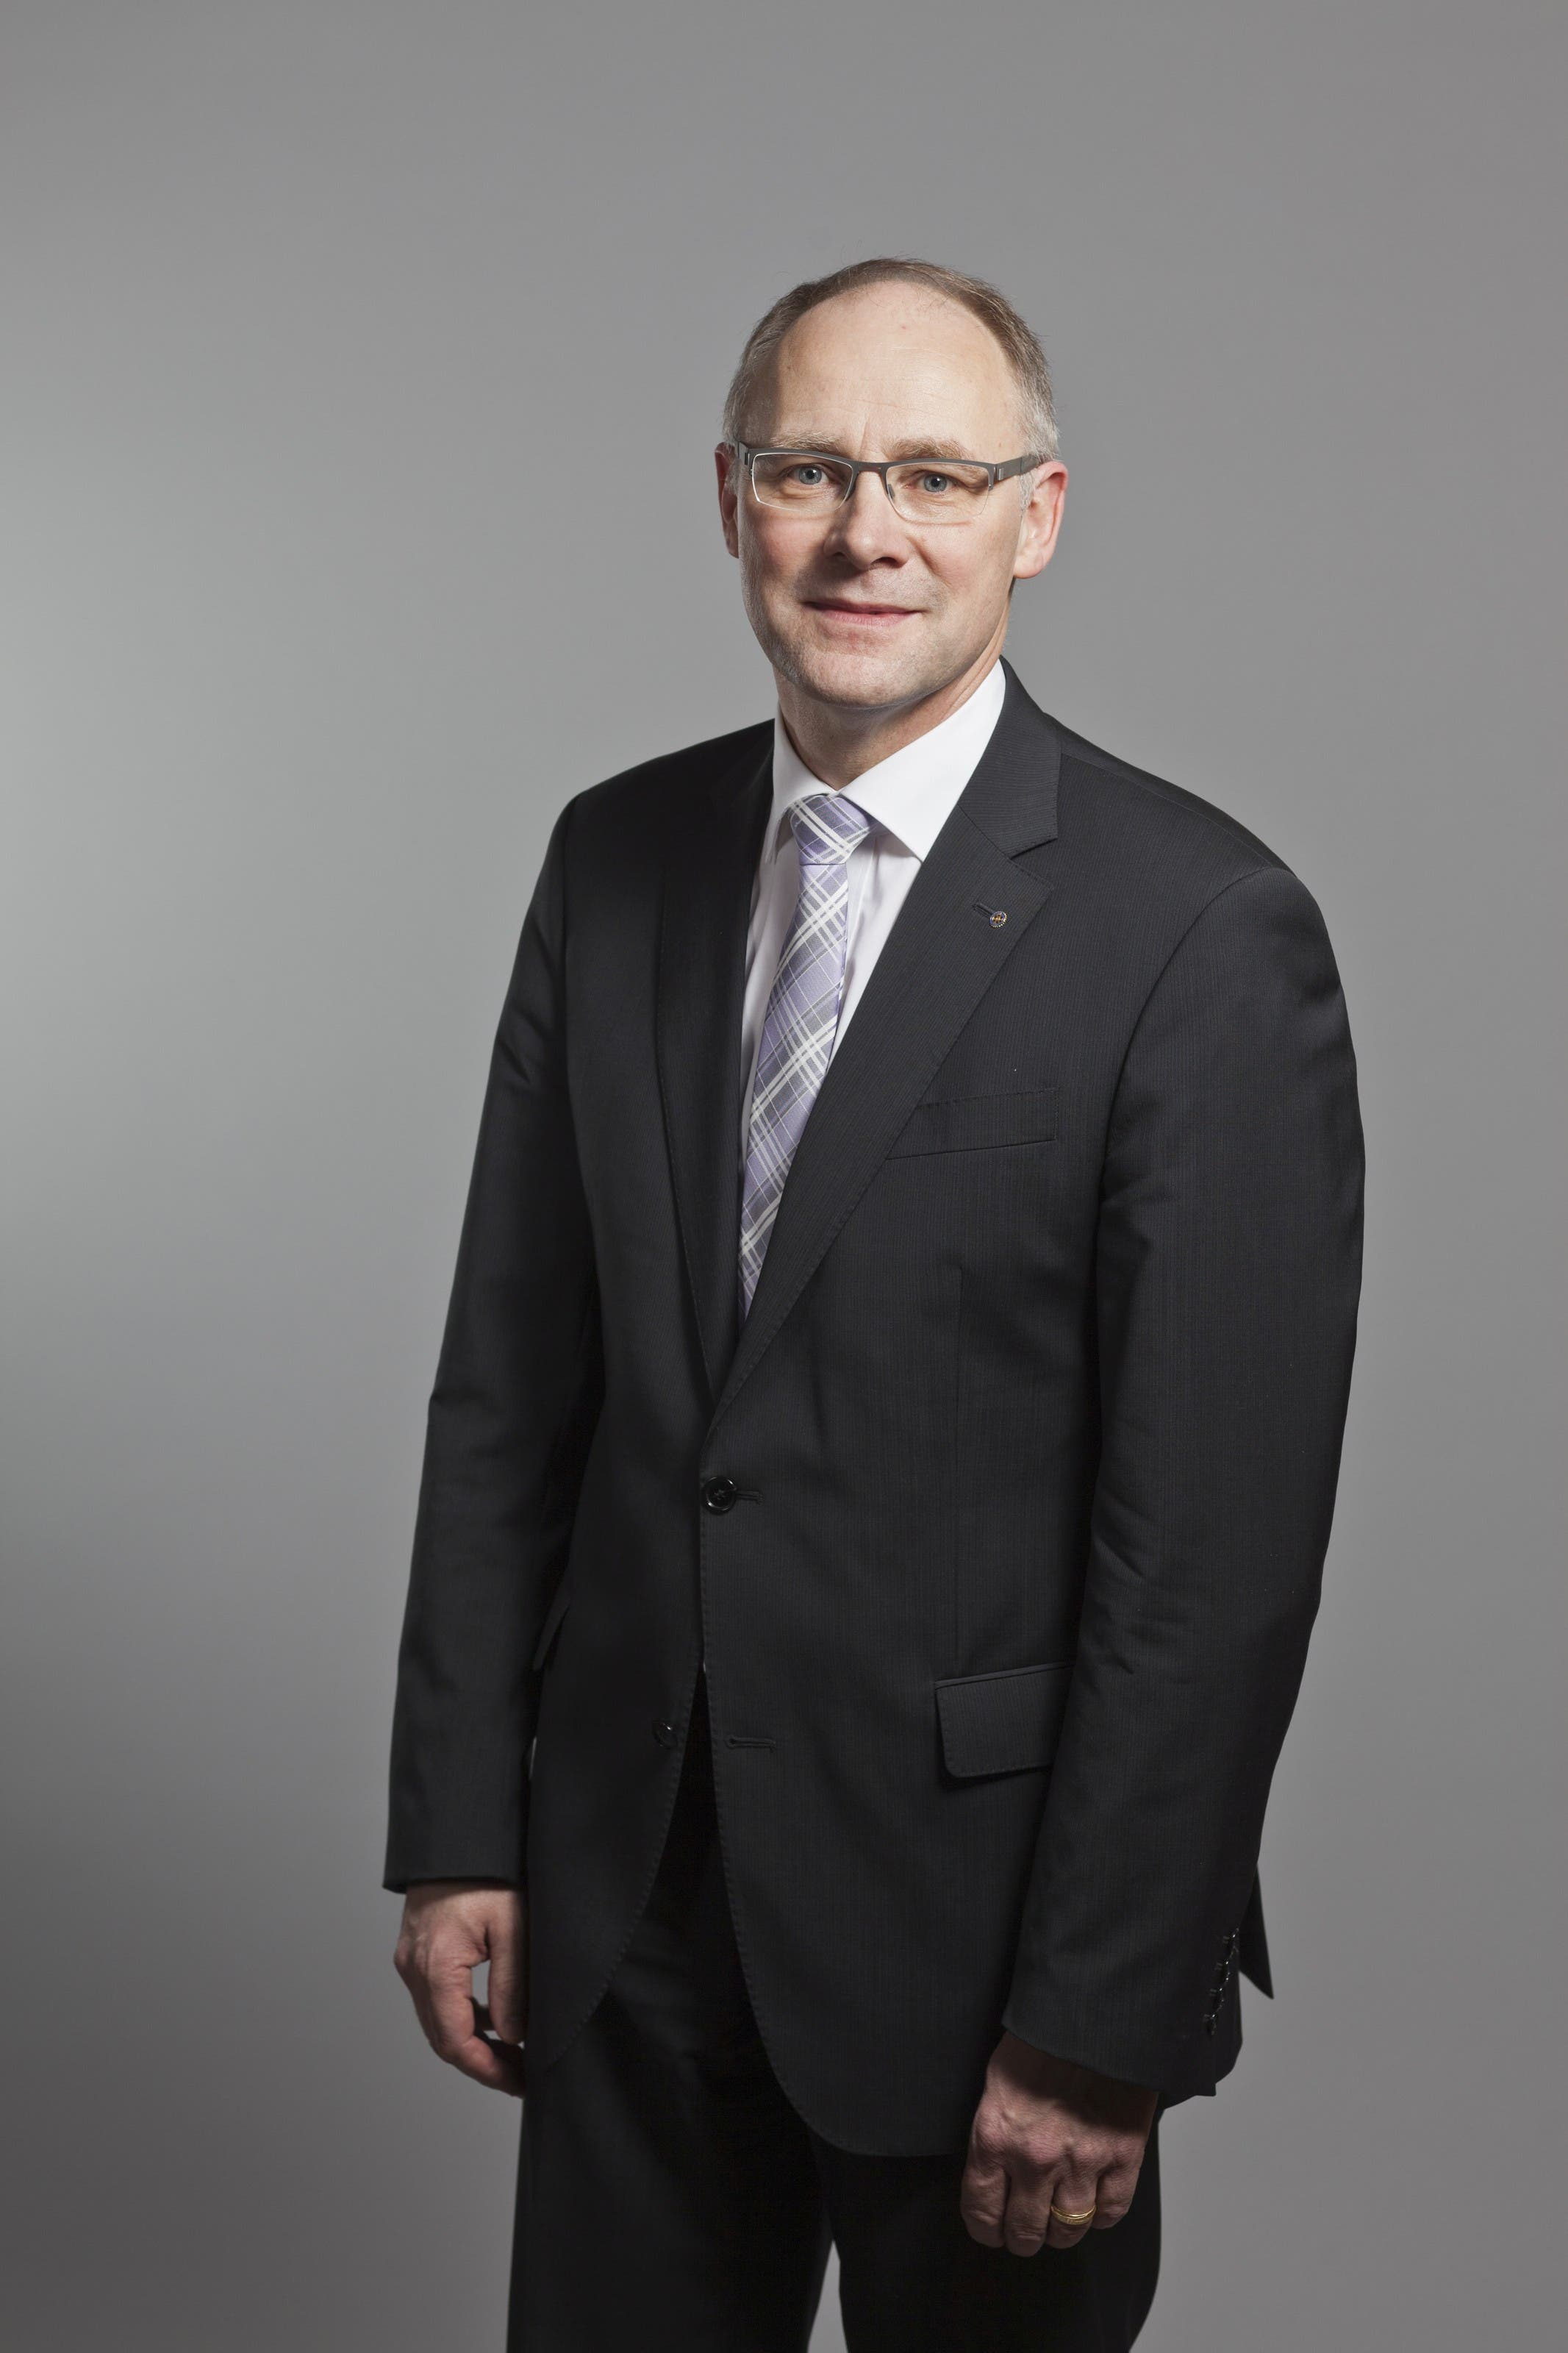 Empfohlen: Hansjörg Knecht, SVP-Nationalrat, Müllerei-Unternehmer.